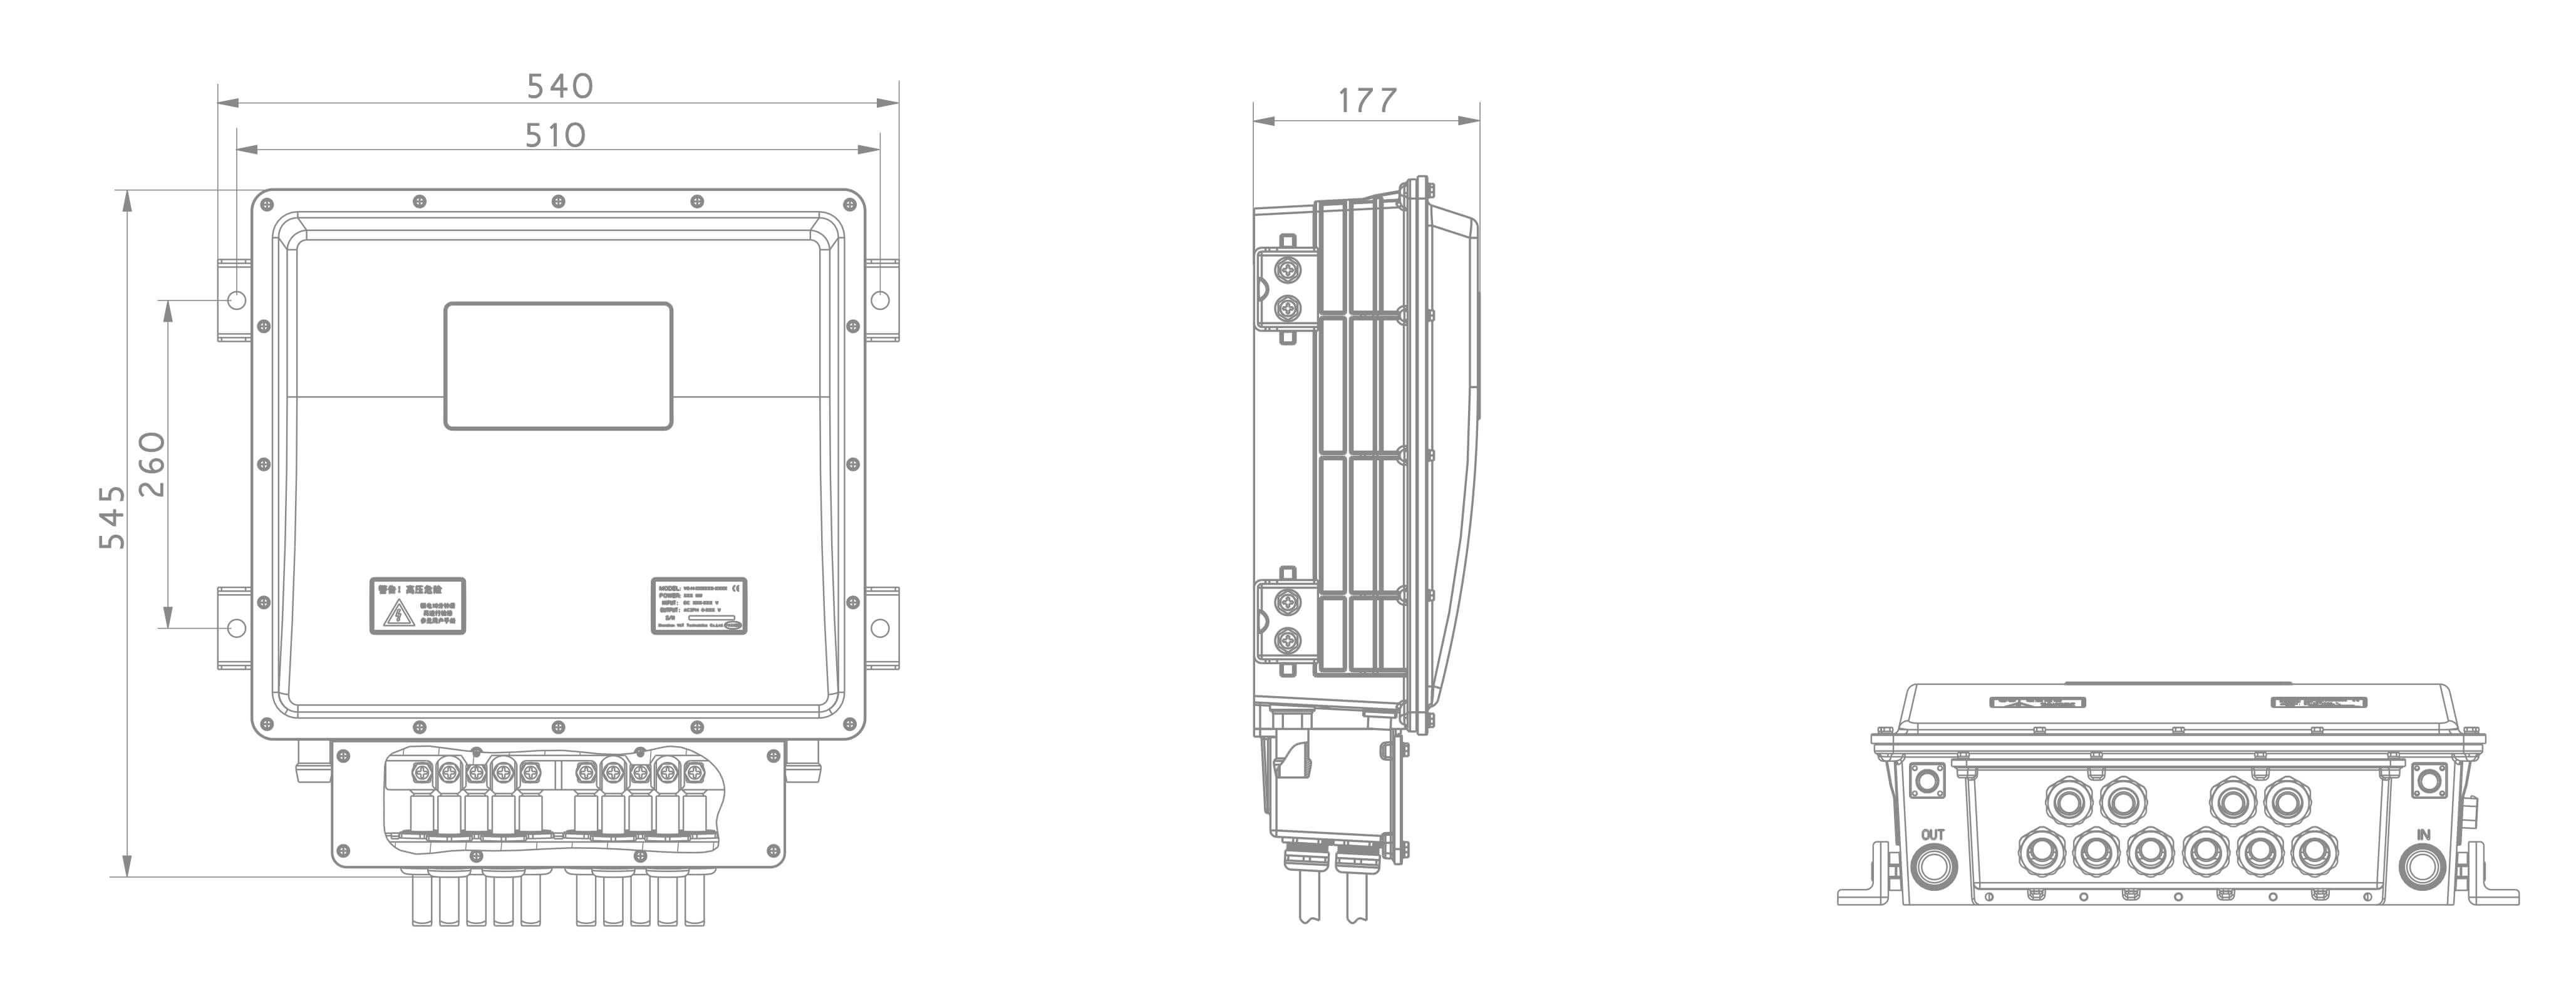 V6-H-4D110G & V6-H-4D110G/ V6-H-2D55G & V6-H-2D55G